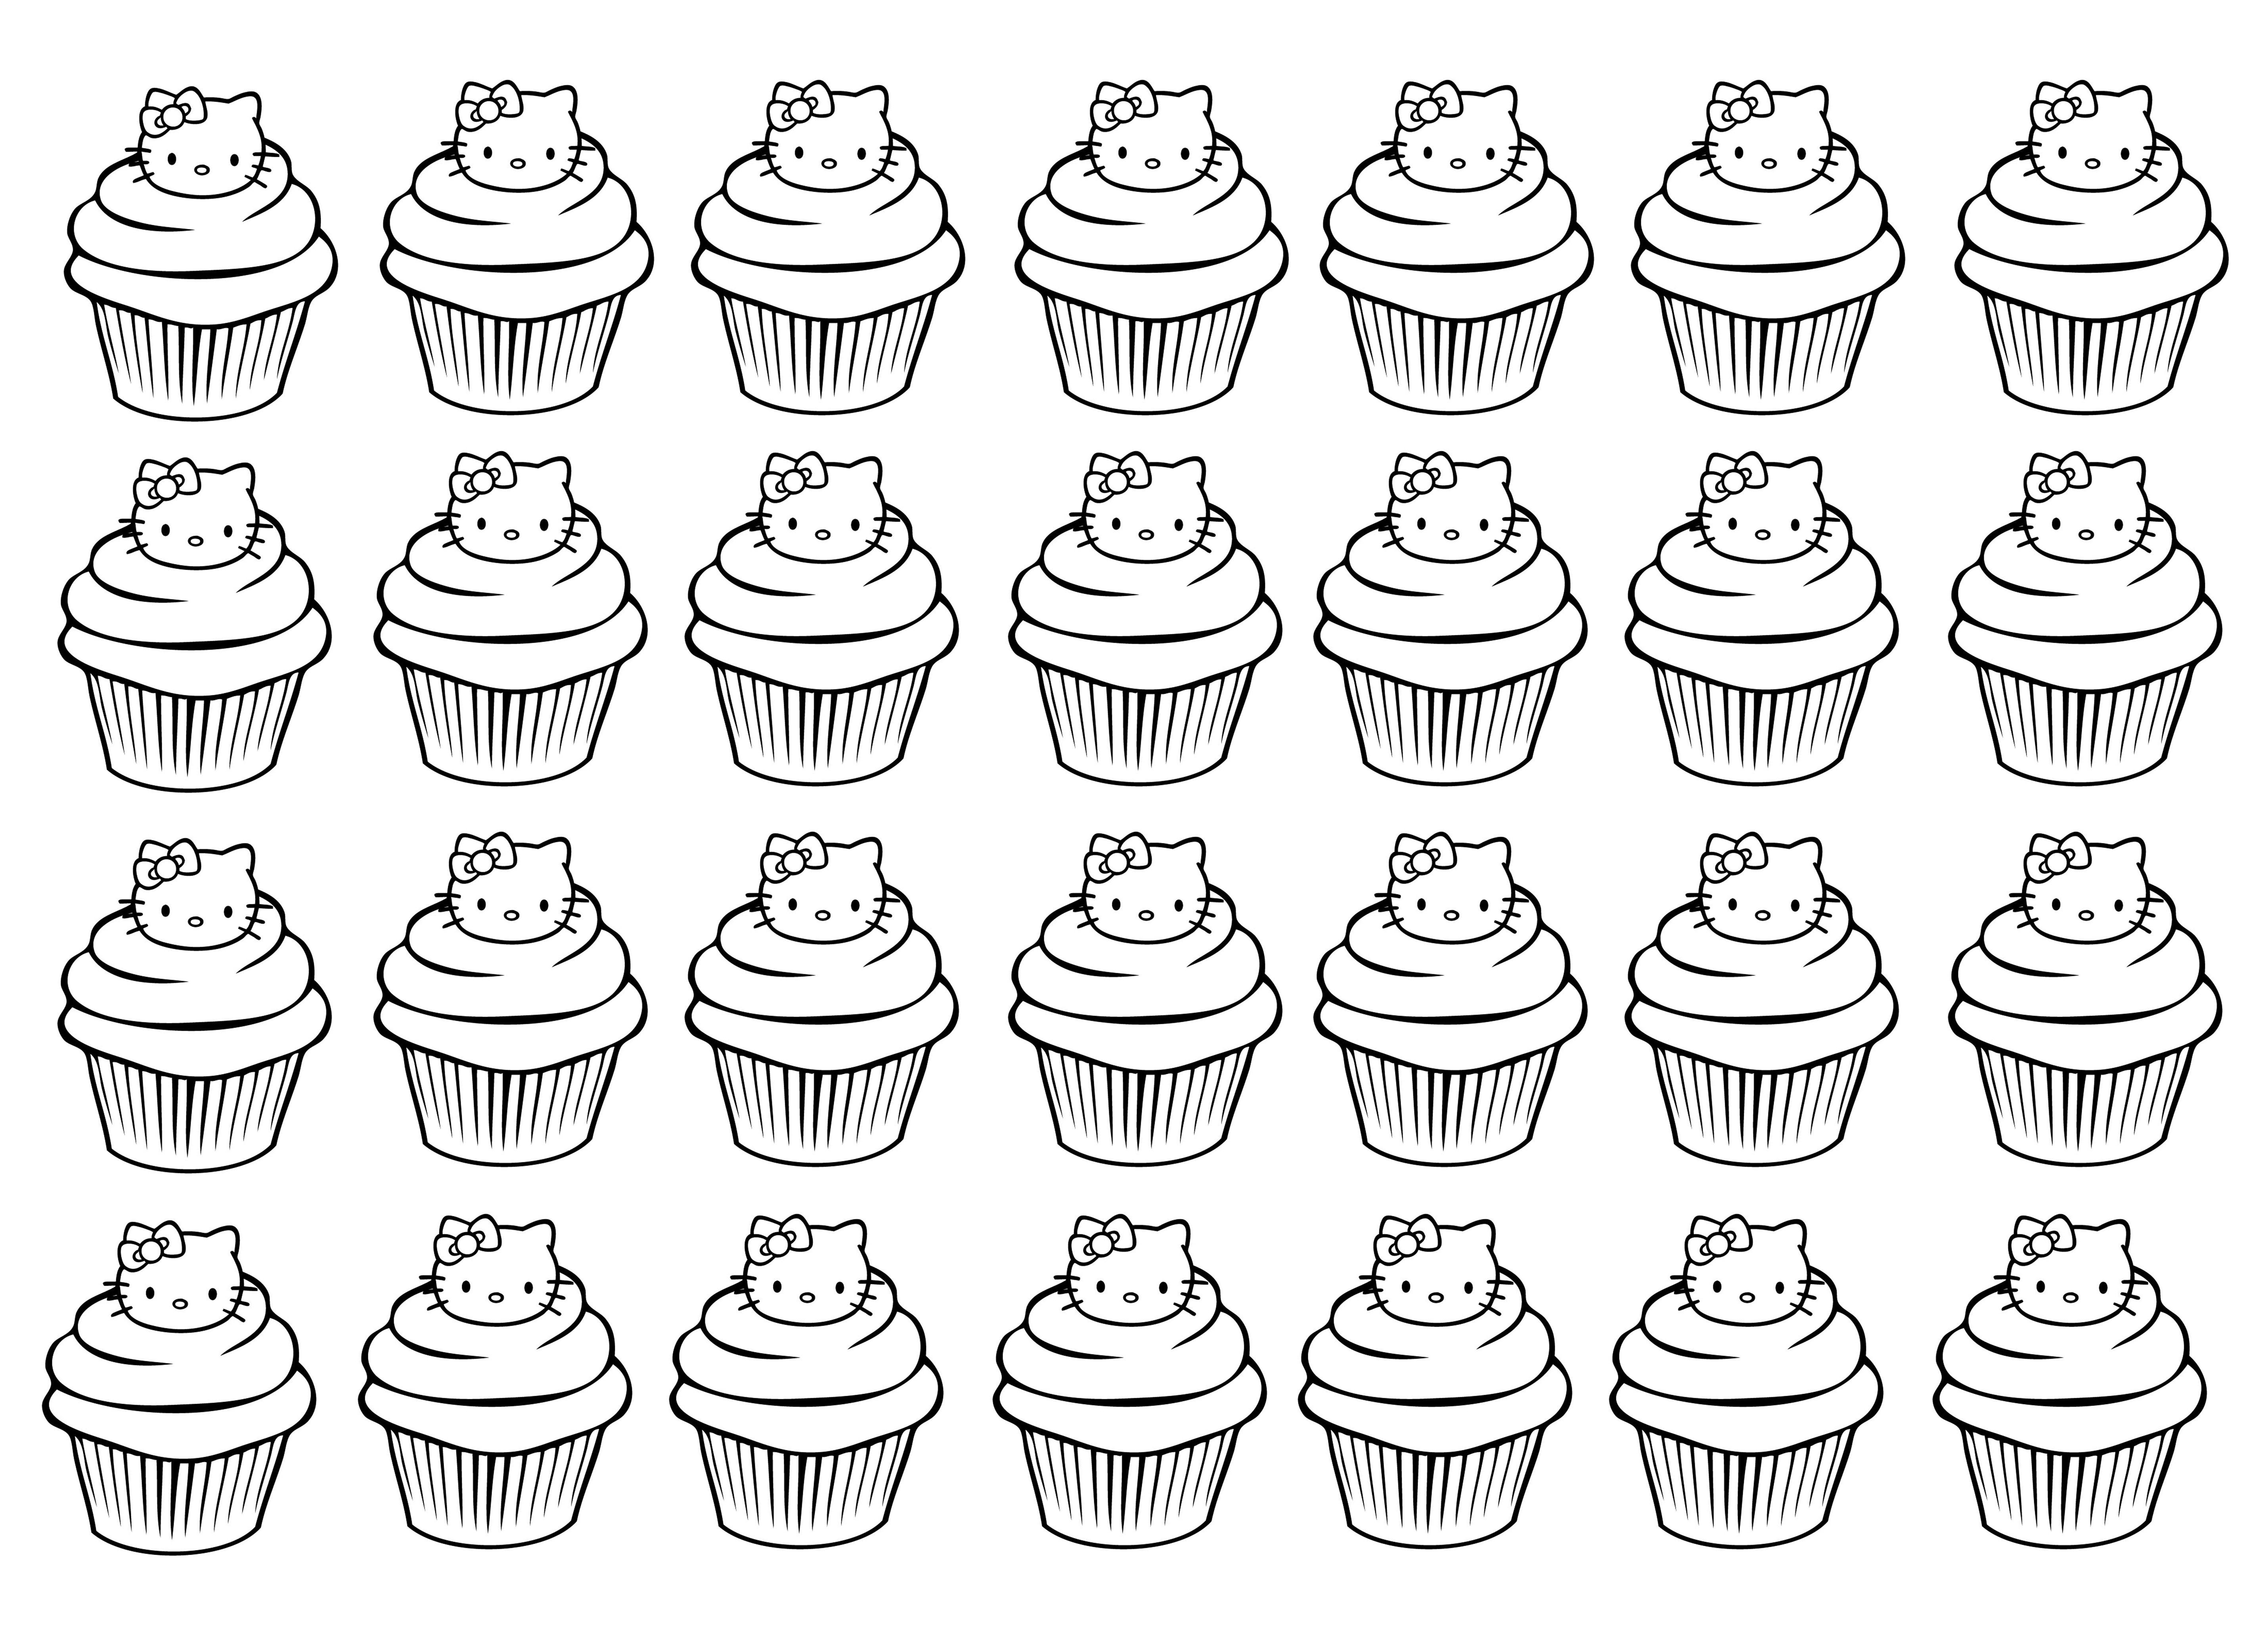 Cup Cakes 71214 Cup Cakes Colorear Para Adultos